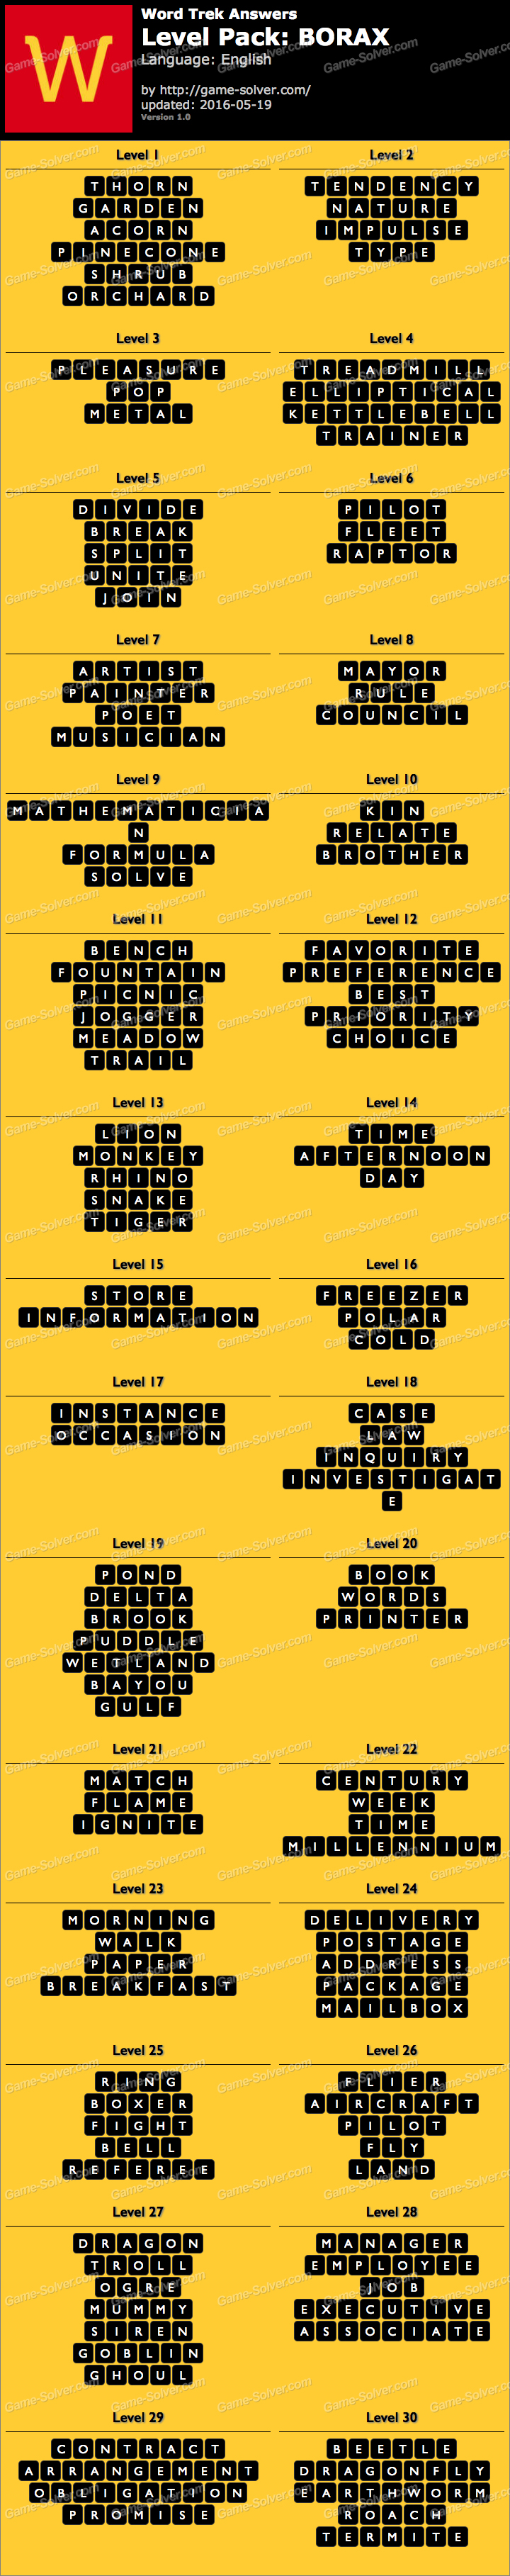 Word Trek Level Pack 73 BORAX Answers